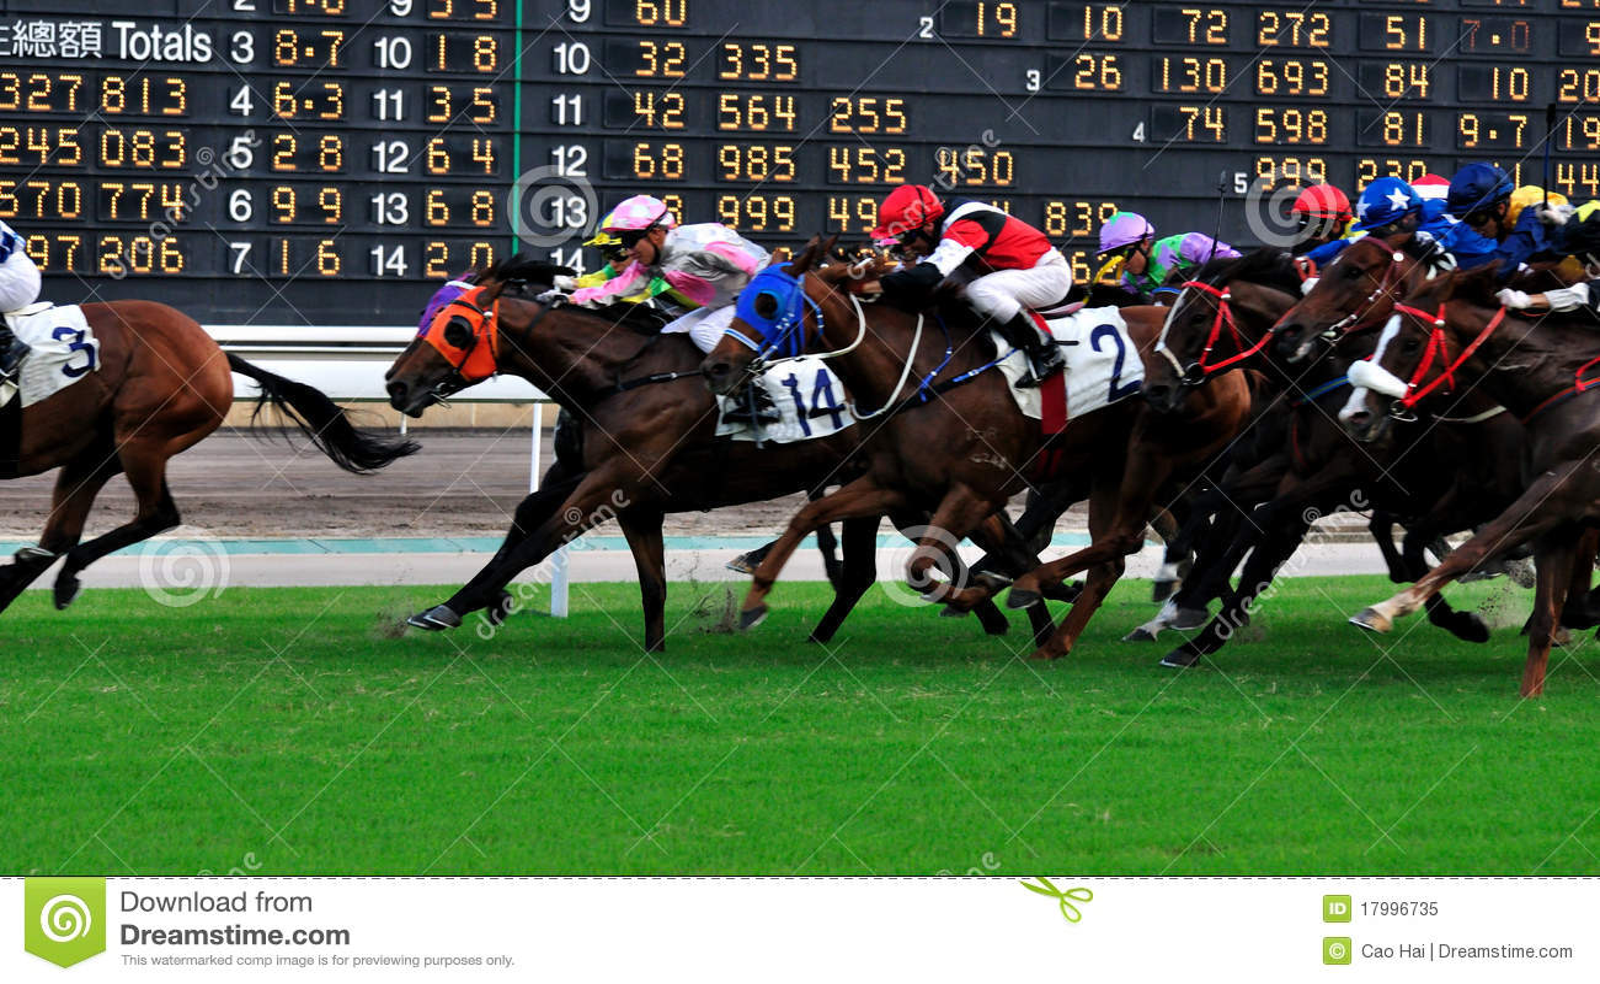 Score board of horse racing